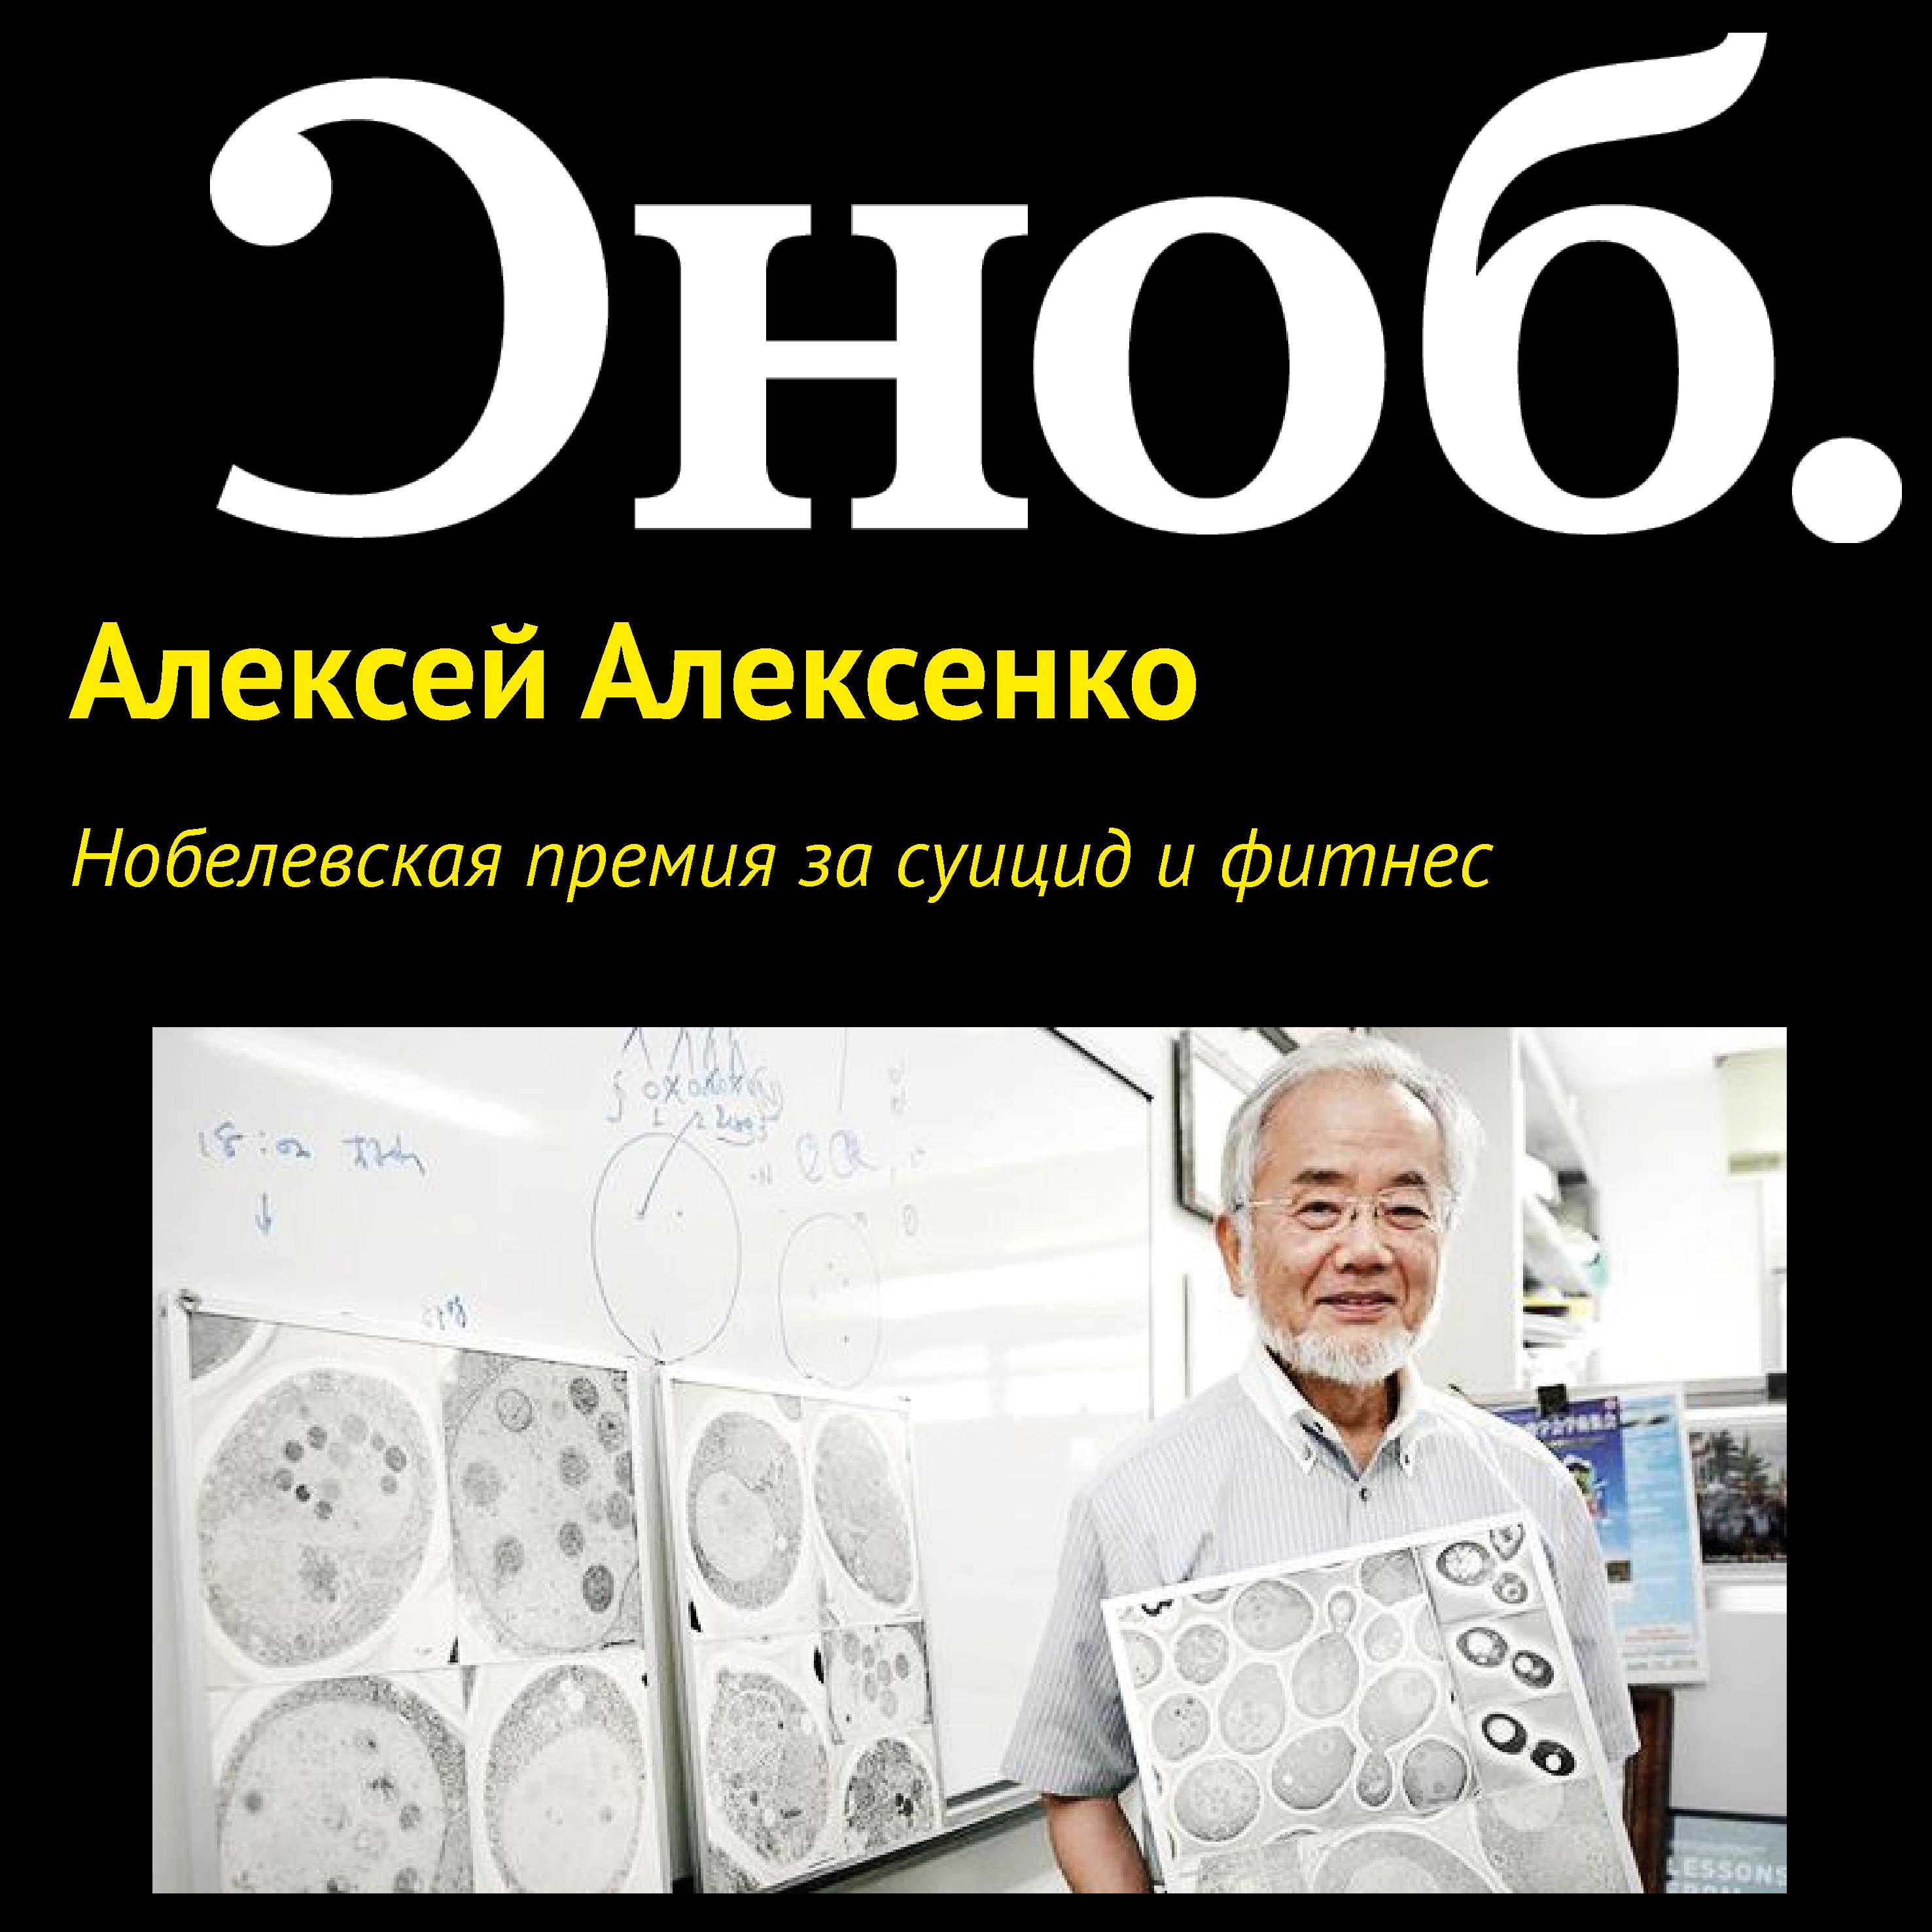 Алексей Алексенко Нобелевская премия за суицид и фитнес цена